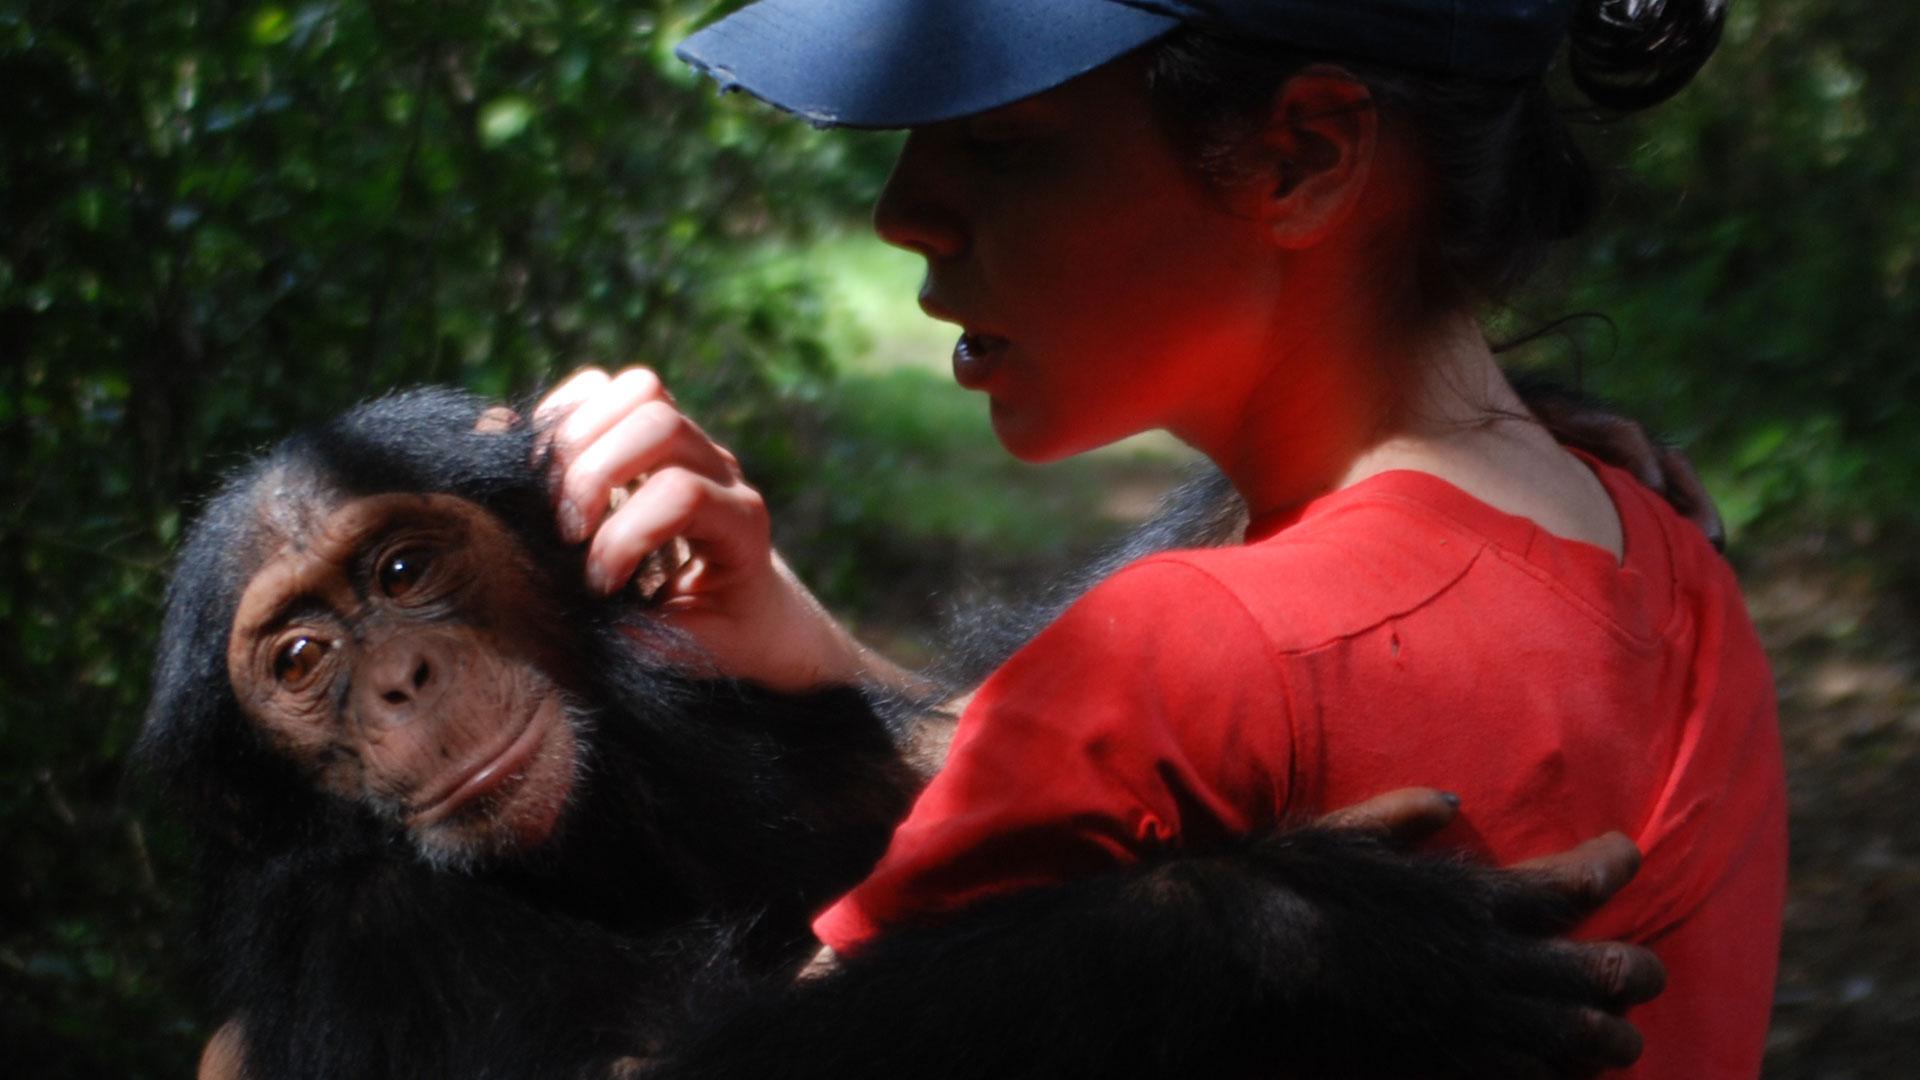 https://rfacdn.nz/zoo/assets/media/mikaylie-chimp-congo-gallery-1.jpg